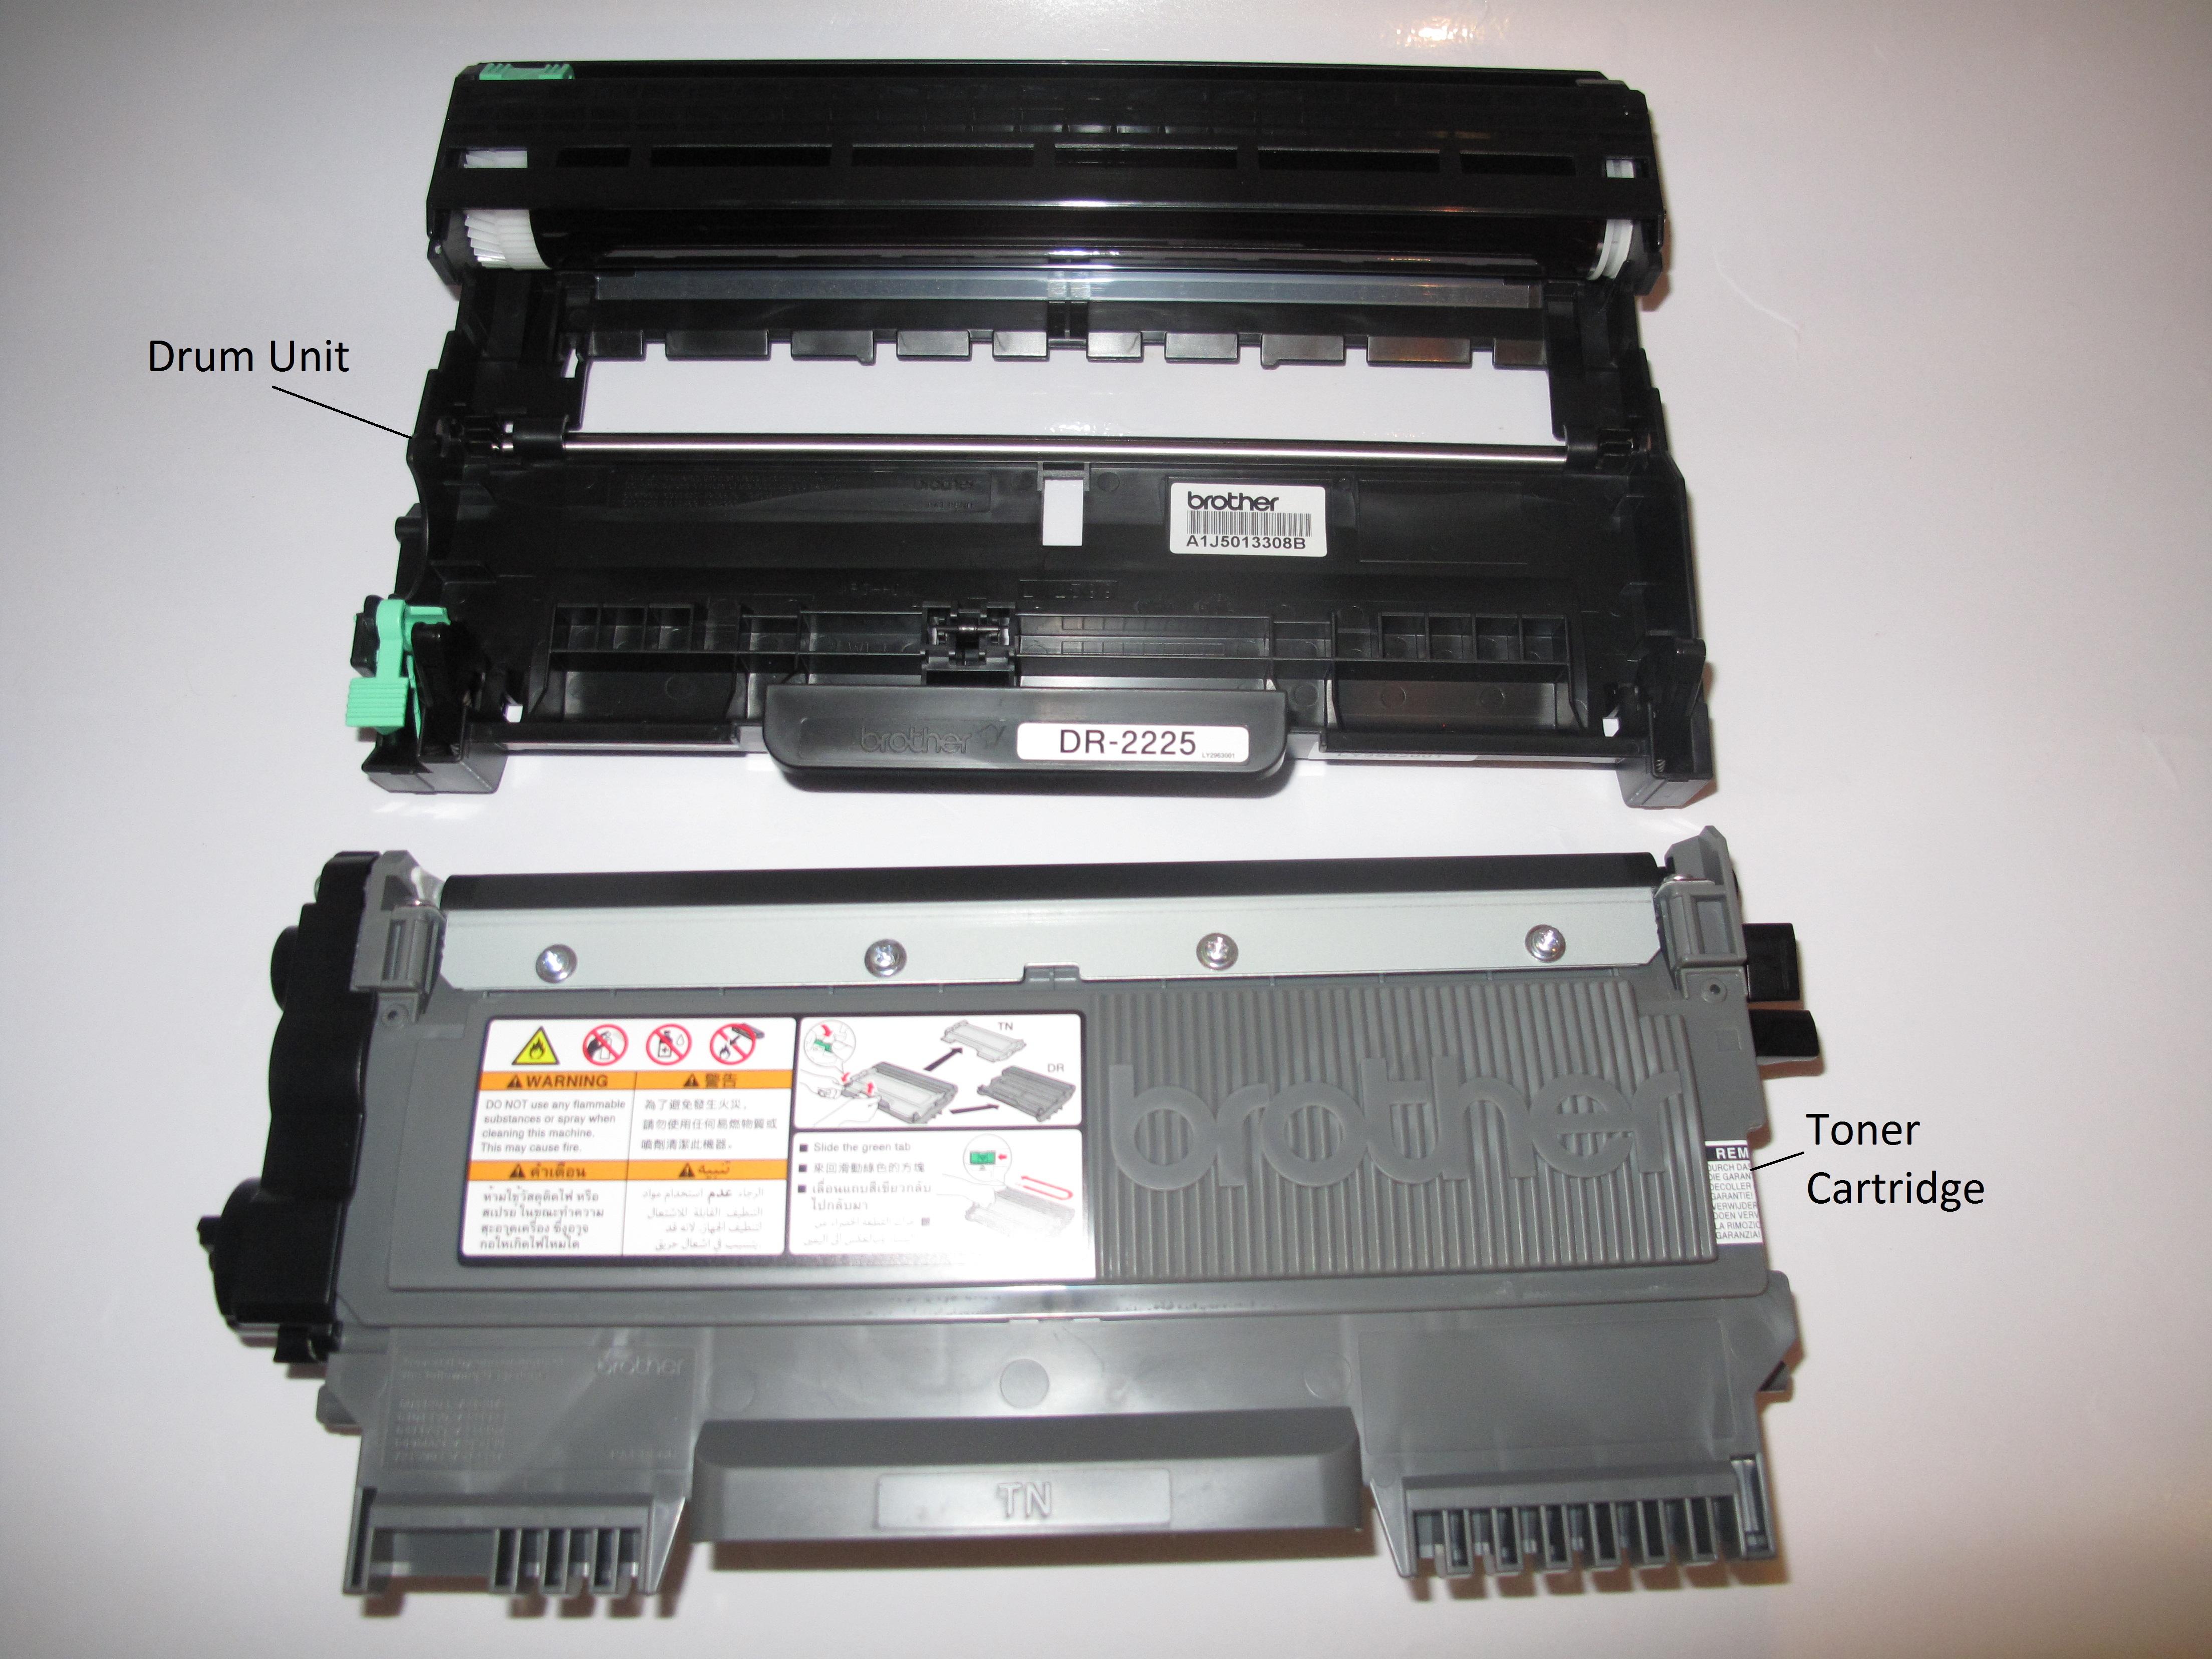 Brother HL-2240D Compact Laser Printer - Toner Cartridge and Drum Unit separate